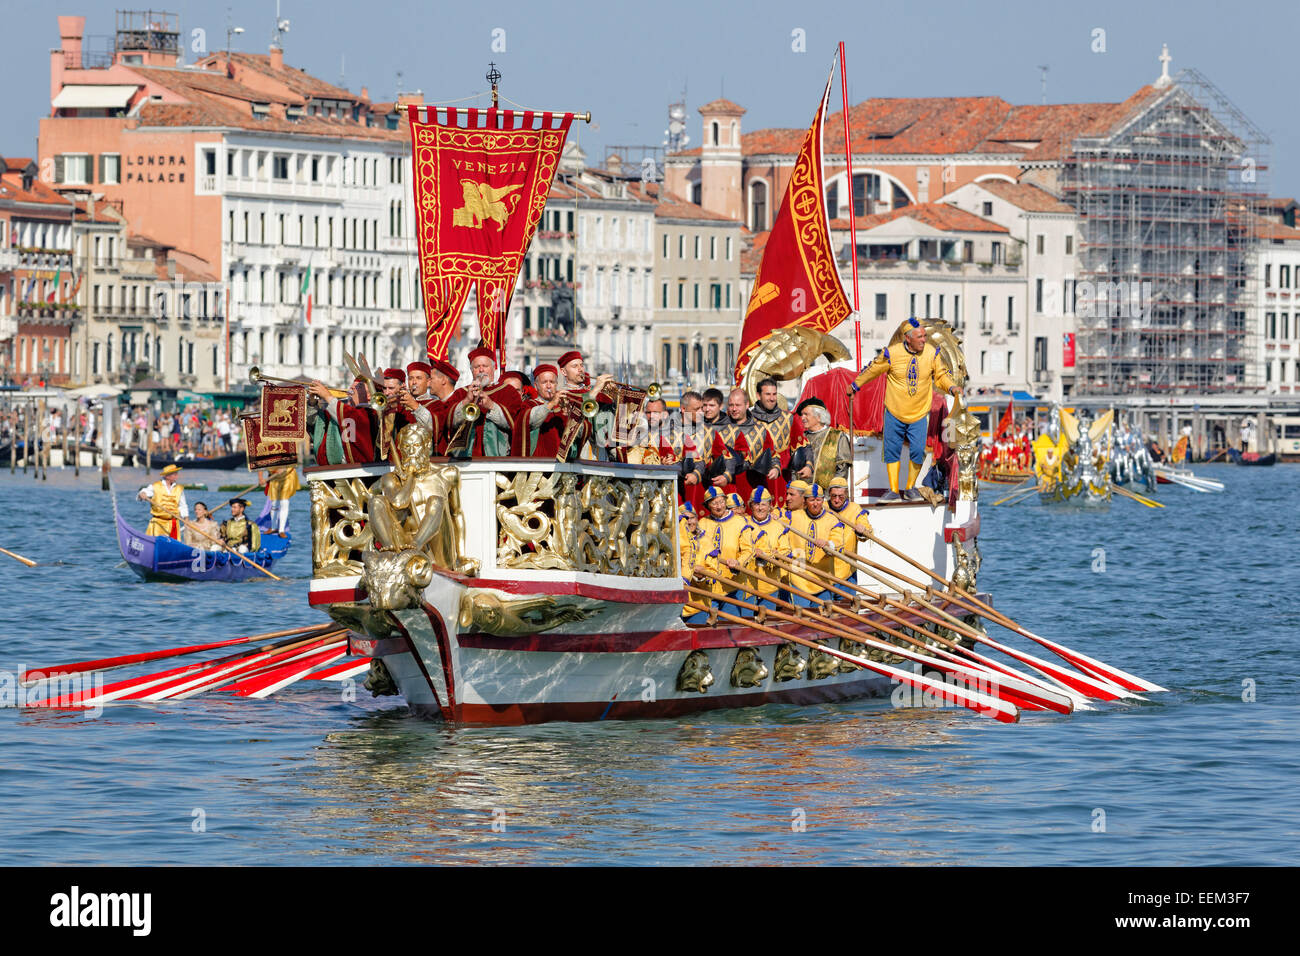 Regata Storica, historical regatta, on the Canal Grande, Venice, Veneto, Italy - Stock Image